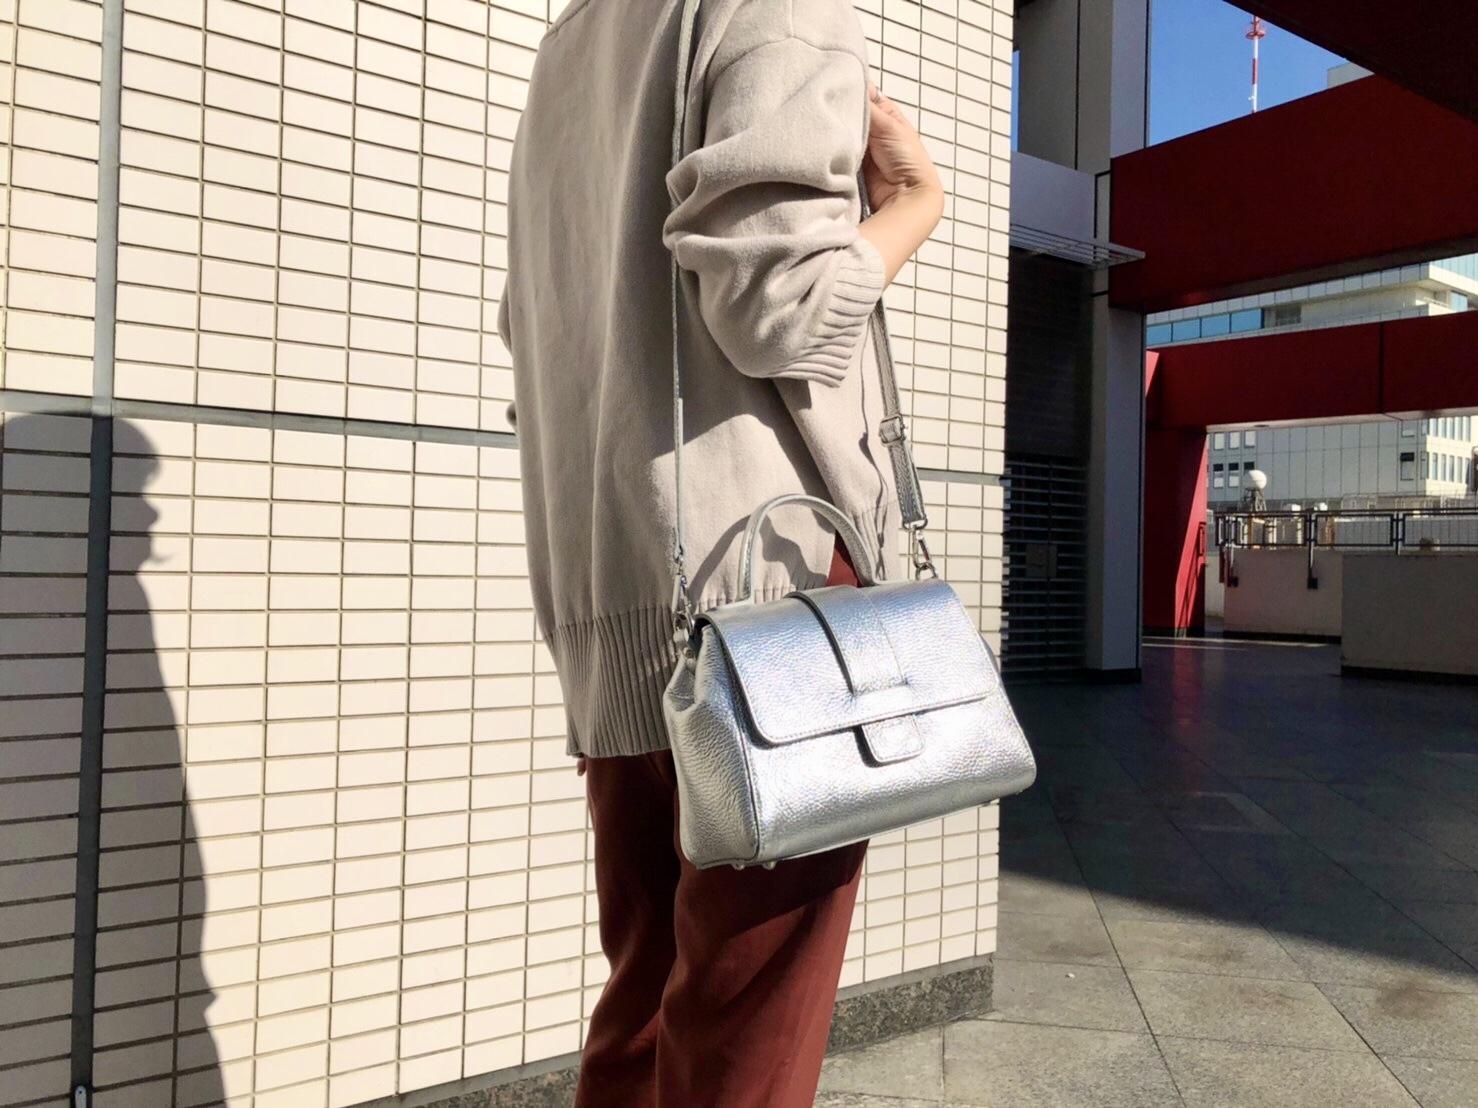 MY BEST BAGS マイベストバッグ scrapbook スクラップ ブック バッグ bag ショルダーバッグ shoulder bag 牛革 東武池袋 池袋東武 東武百貨店